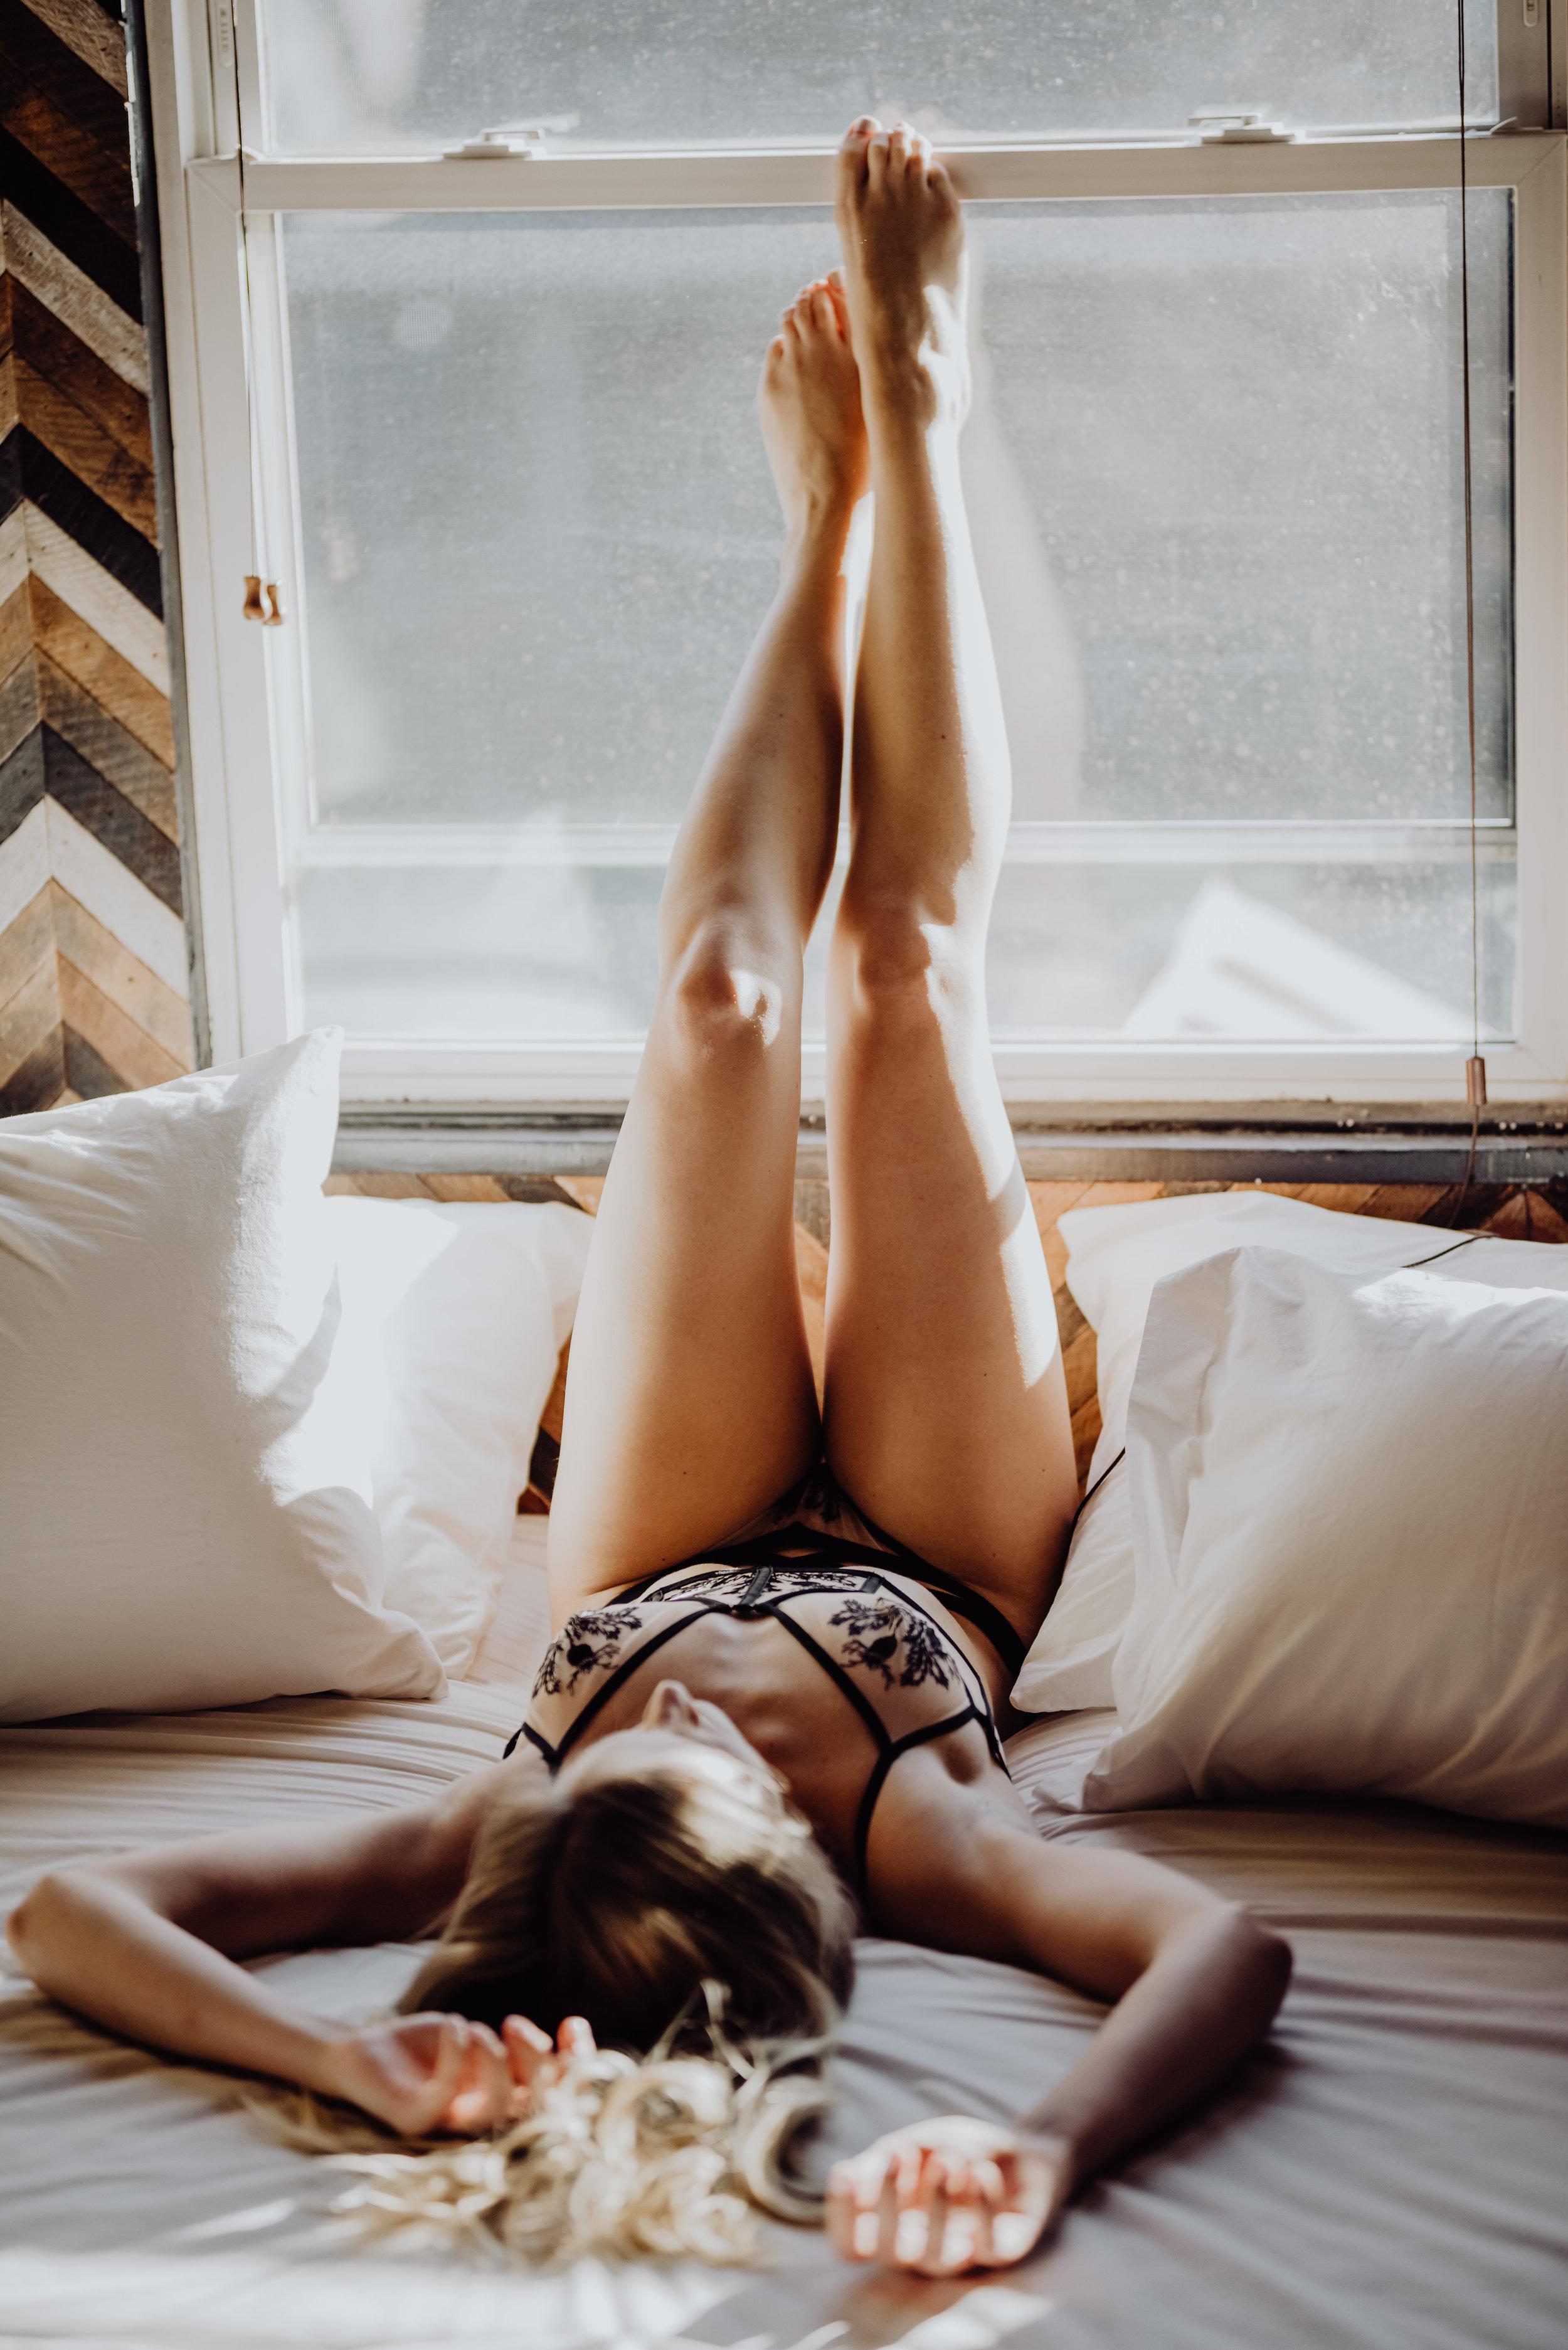 rene nashville boudoir by wilde company-11.jpg